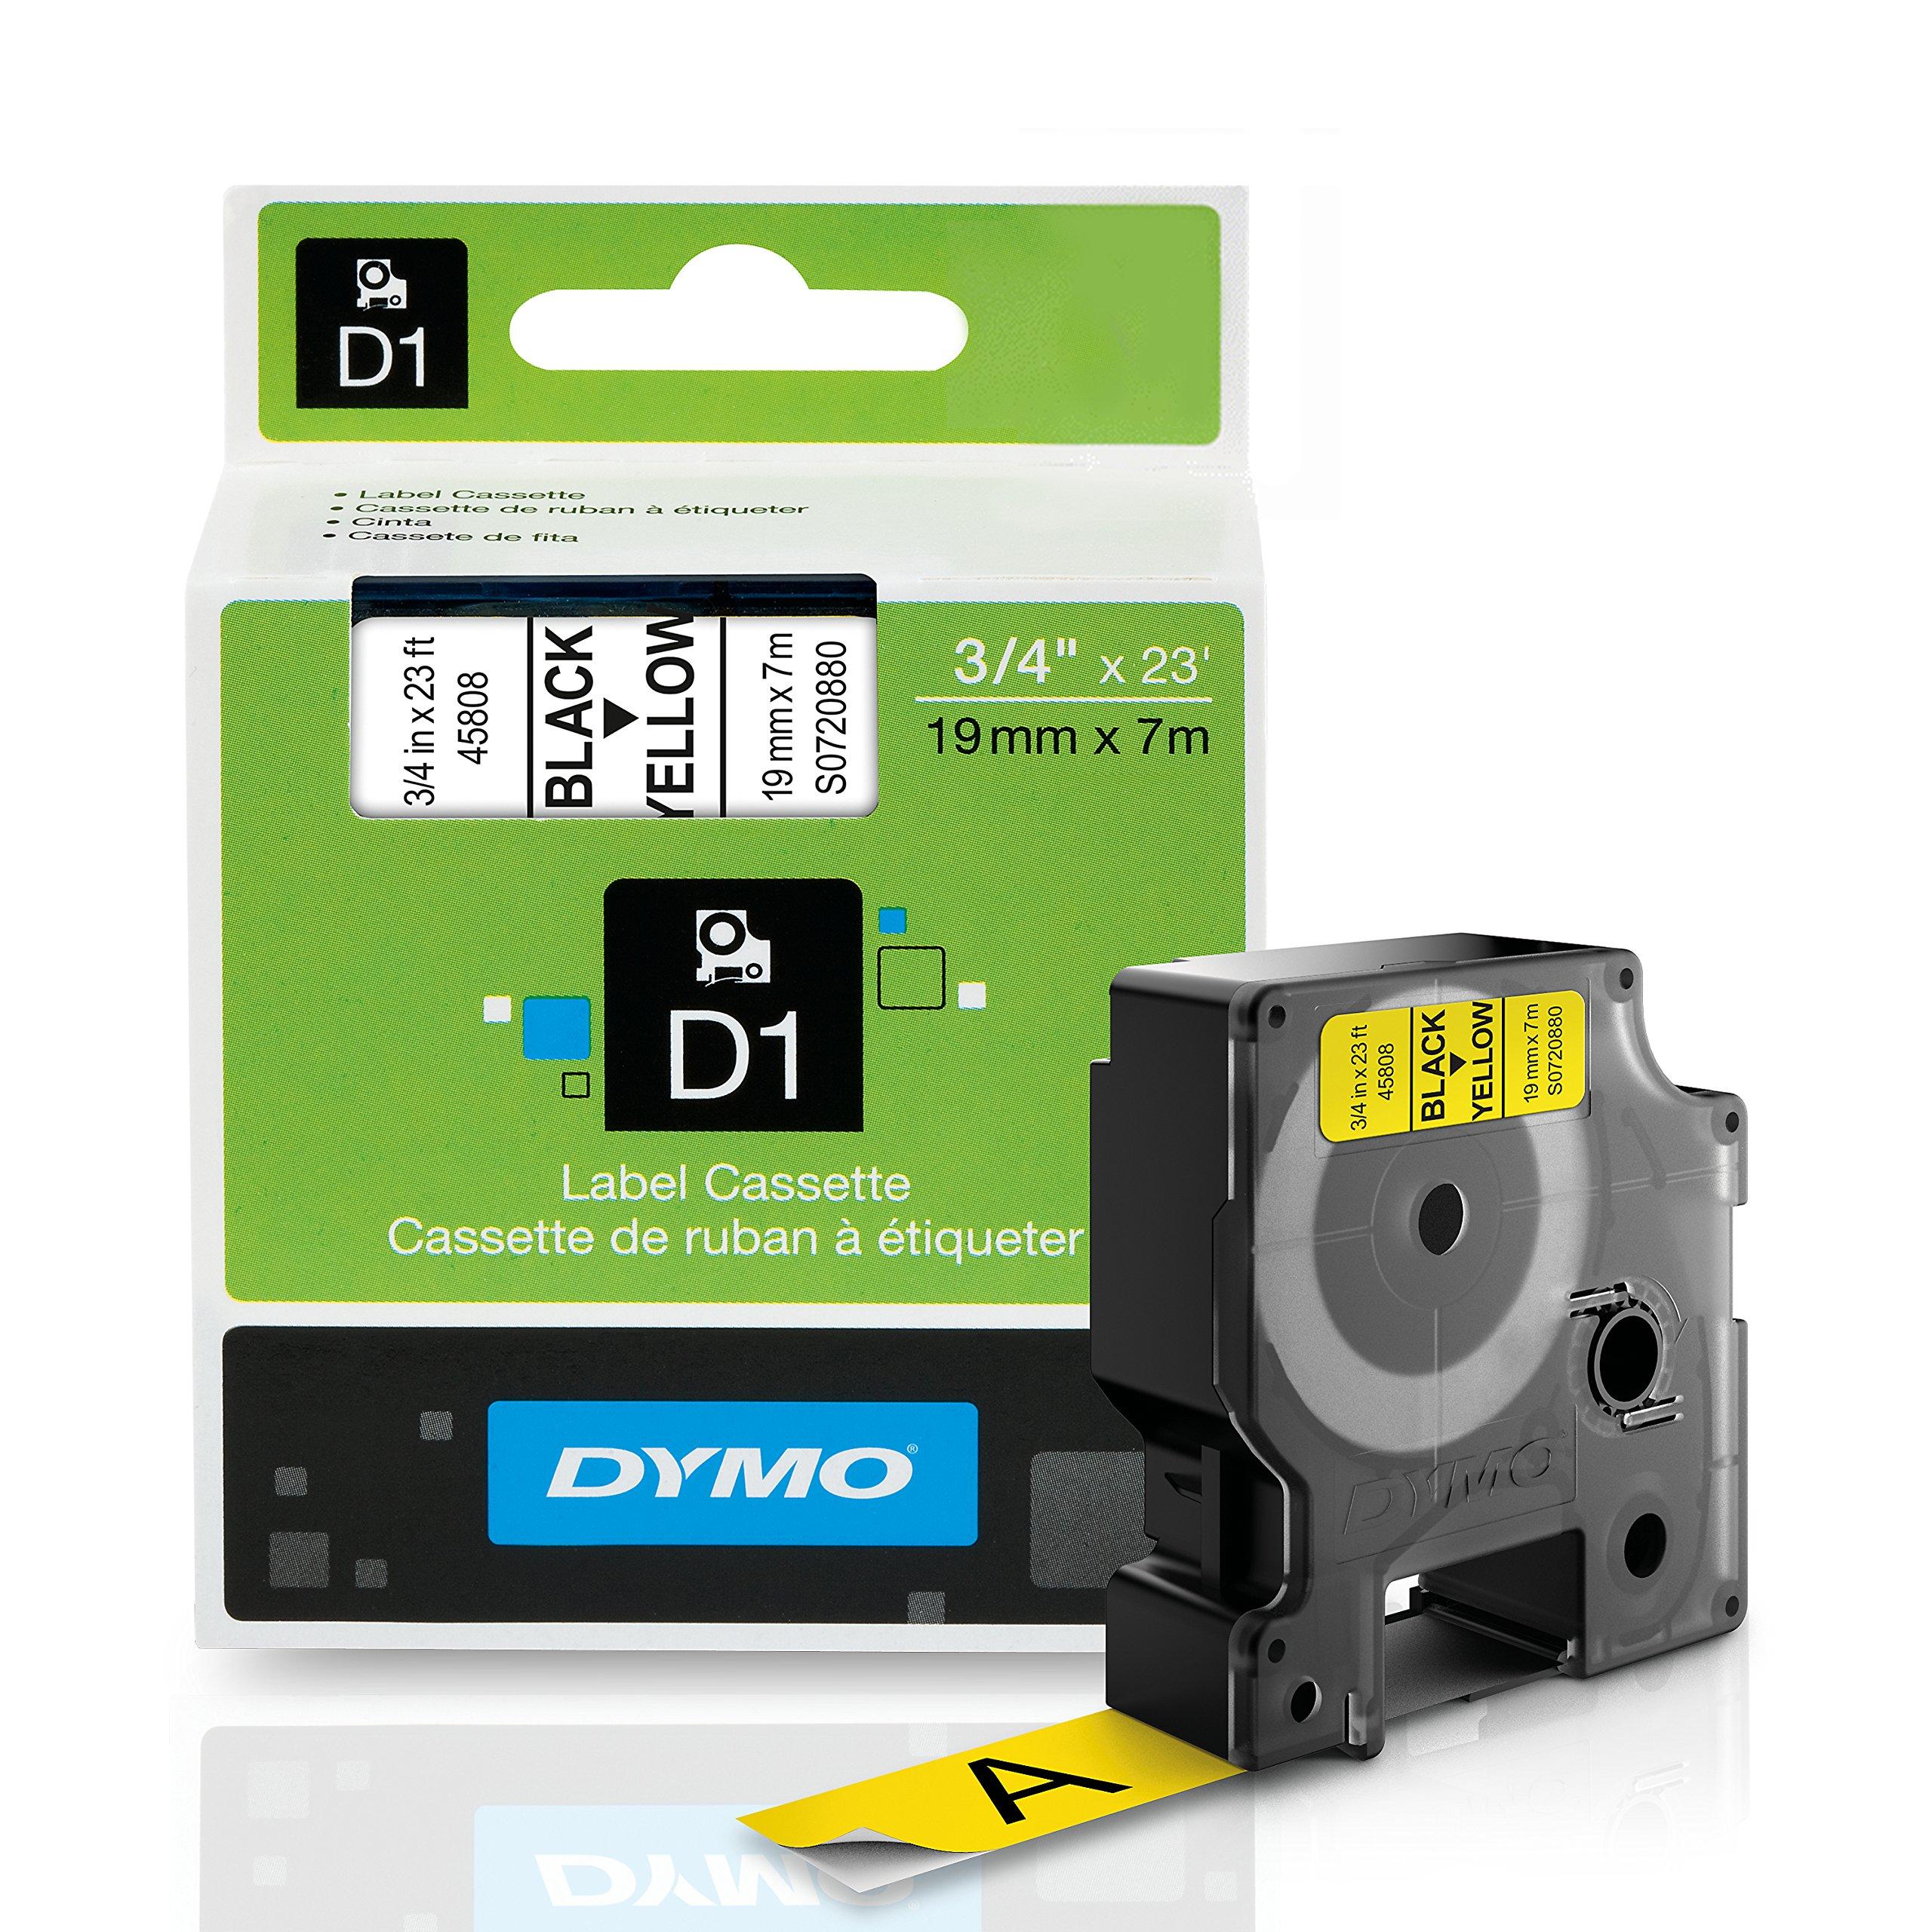 DYMO Standard D1 45808 Labeling Tape (Black Print on Yellow Tape, 3/4'' W x 23' L, 1 Cartridge)